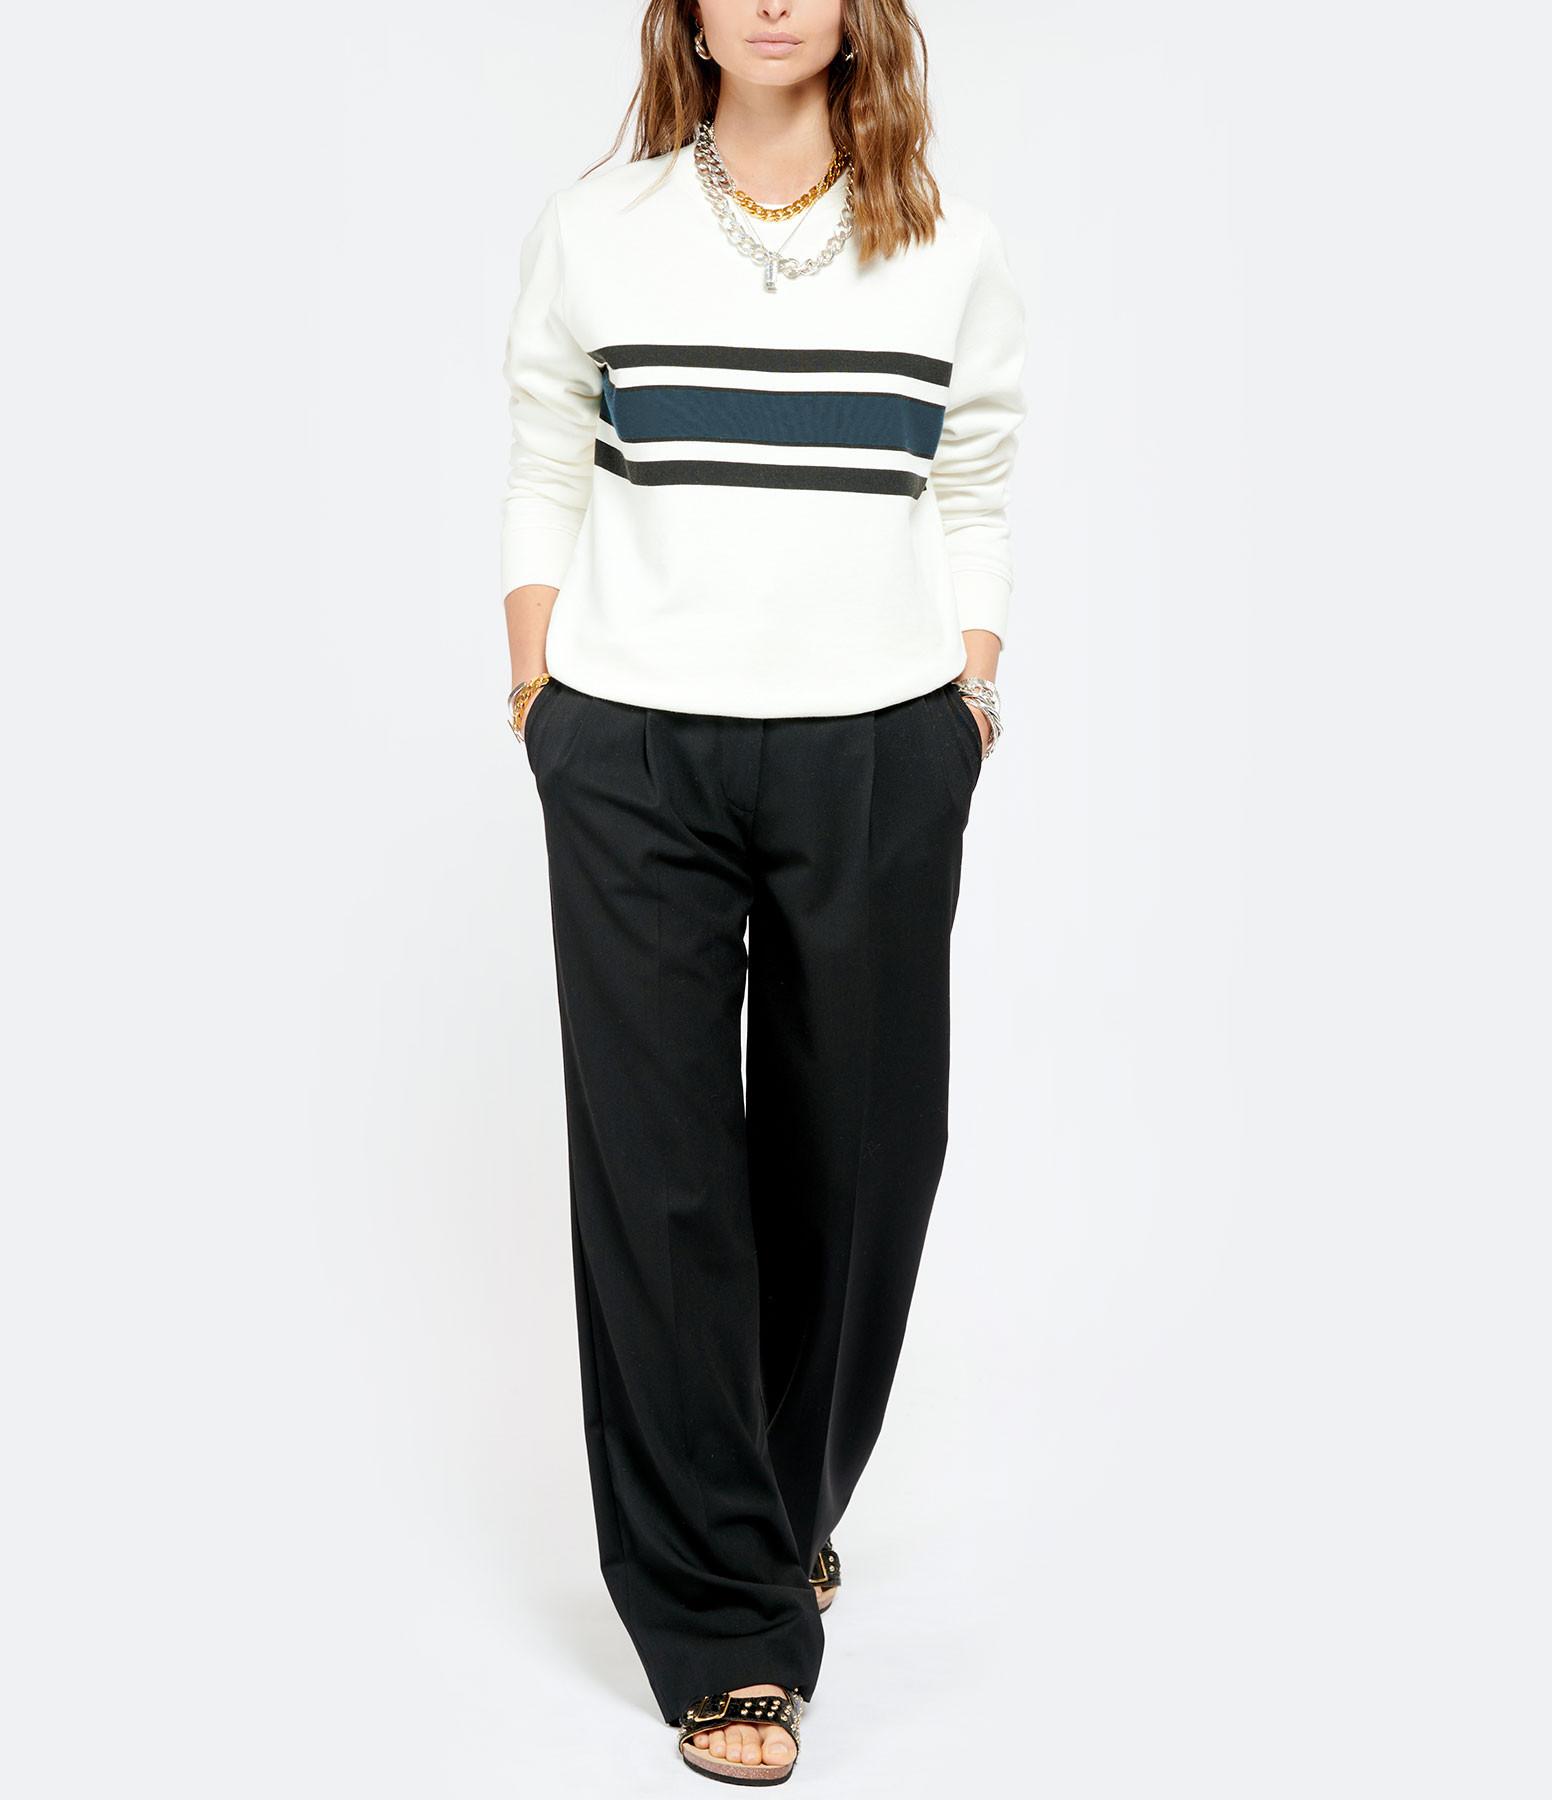 MAISON SARAH LAVOINE - Sweatshirt Icone Beige